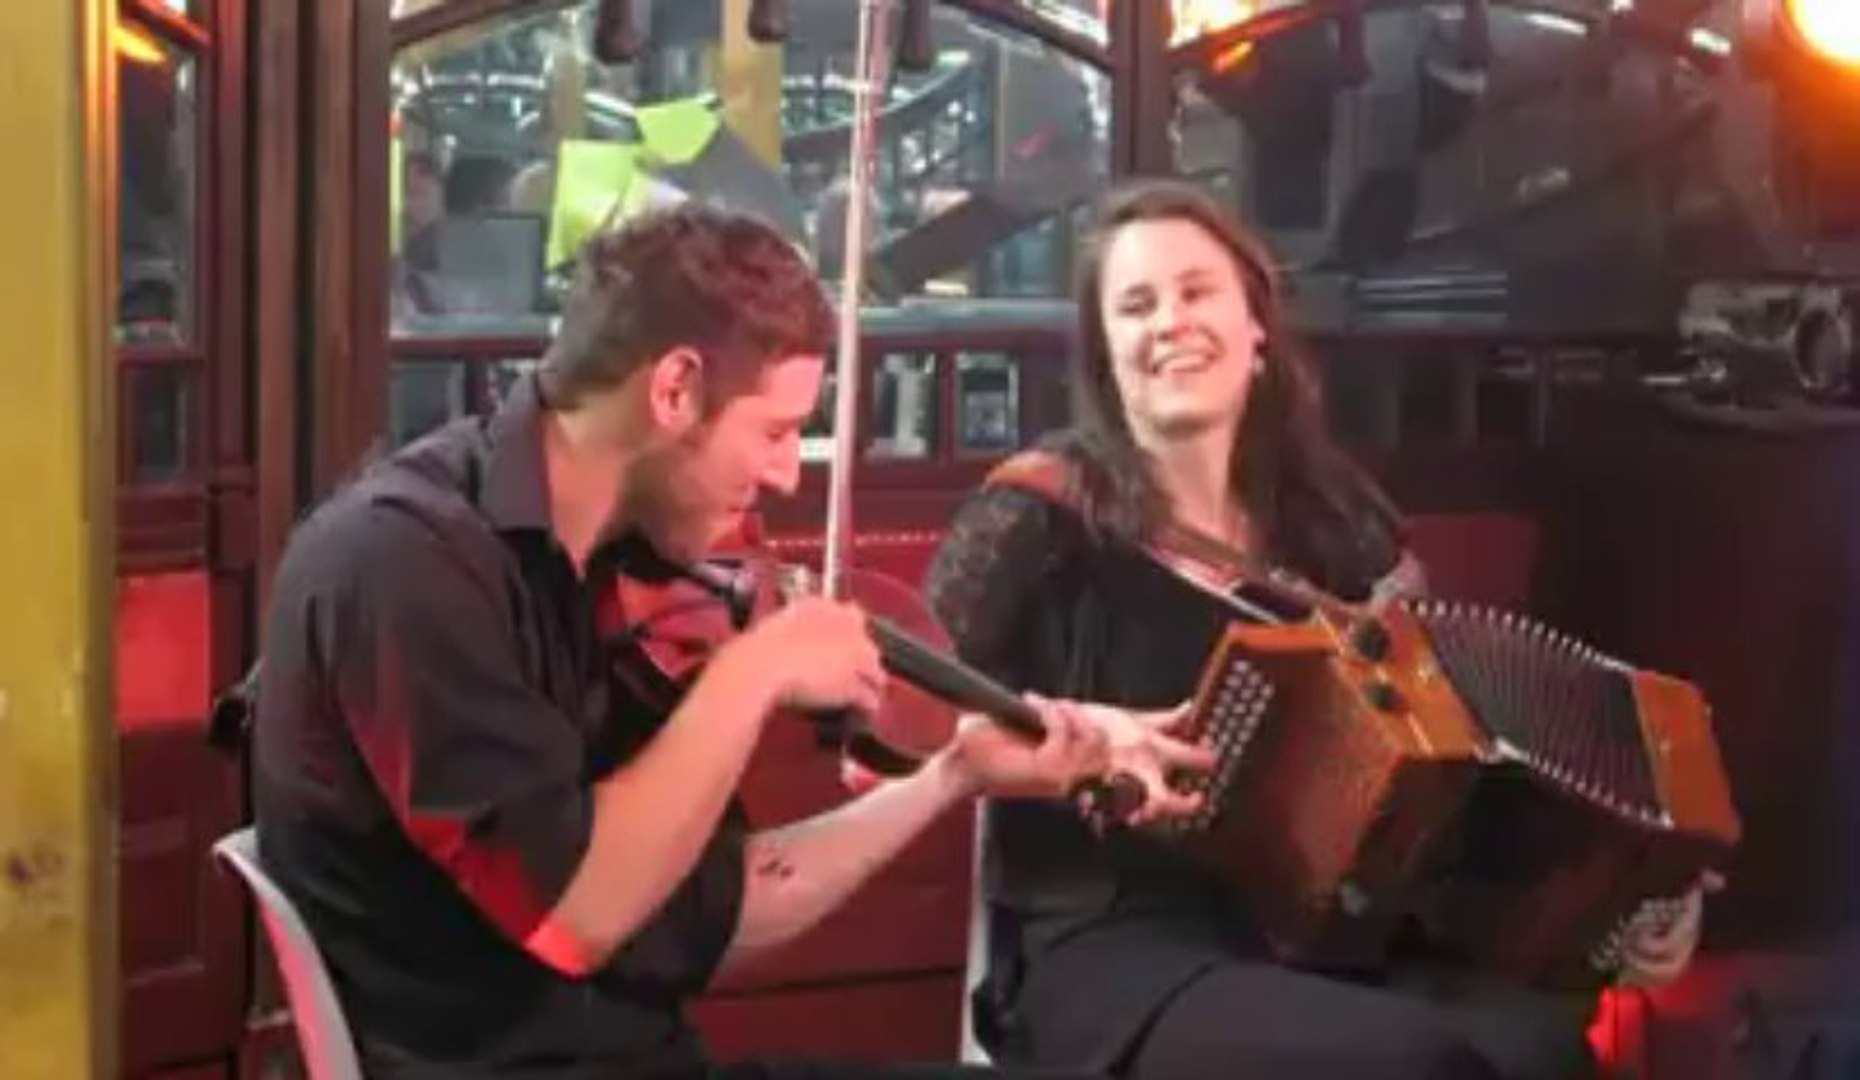 Festival de violons à Calais : Sophie Cavez et Baltazar Montanaro